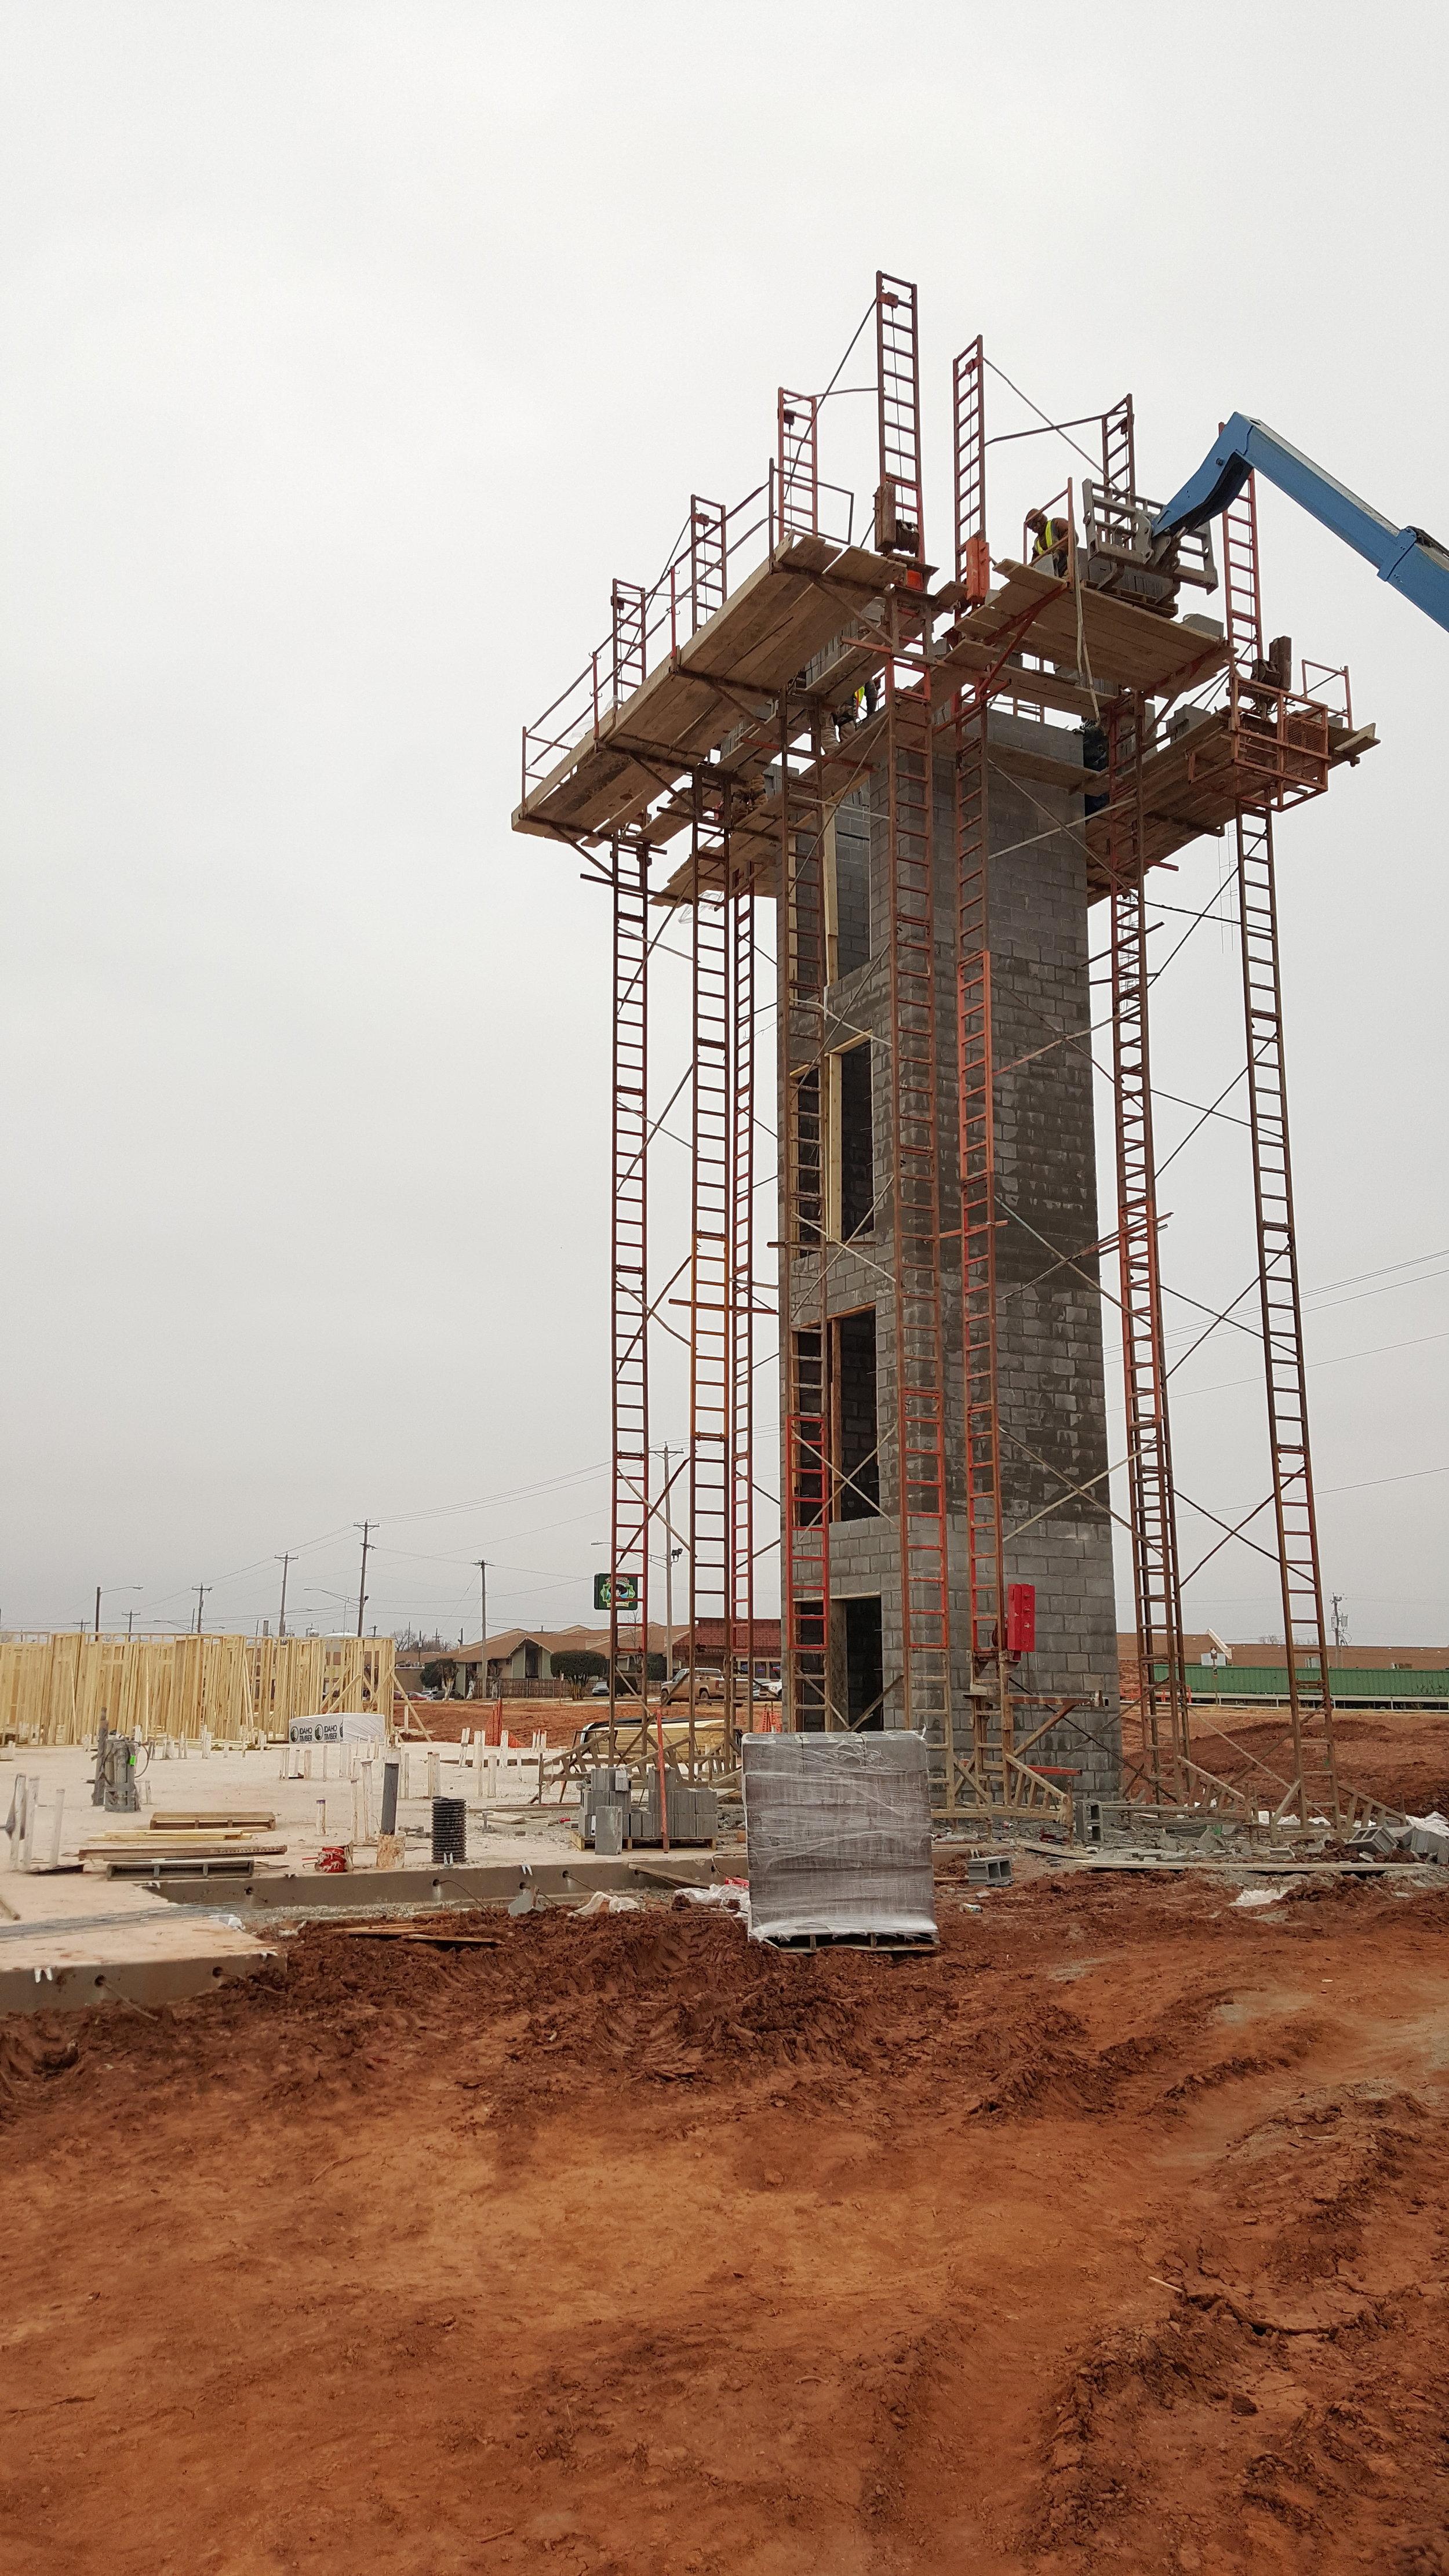 Progress 405 Stillwater, Oklahoma